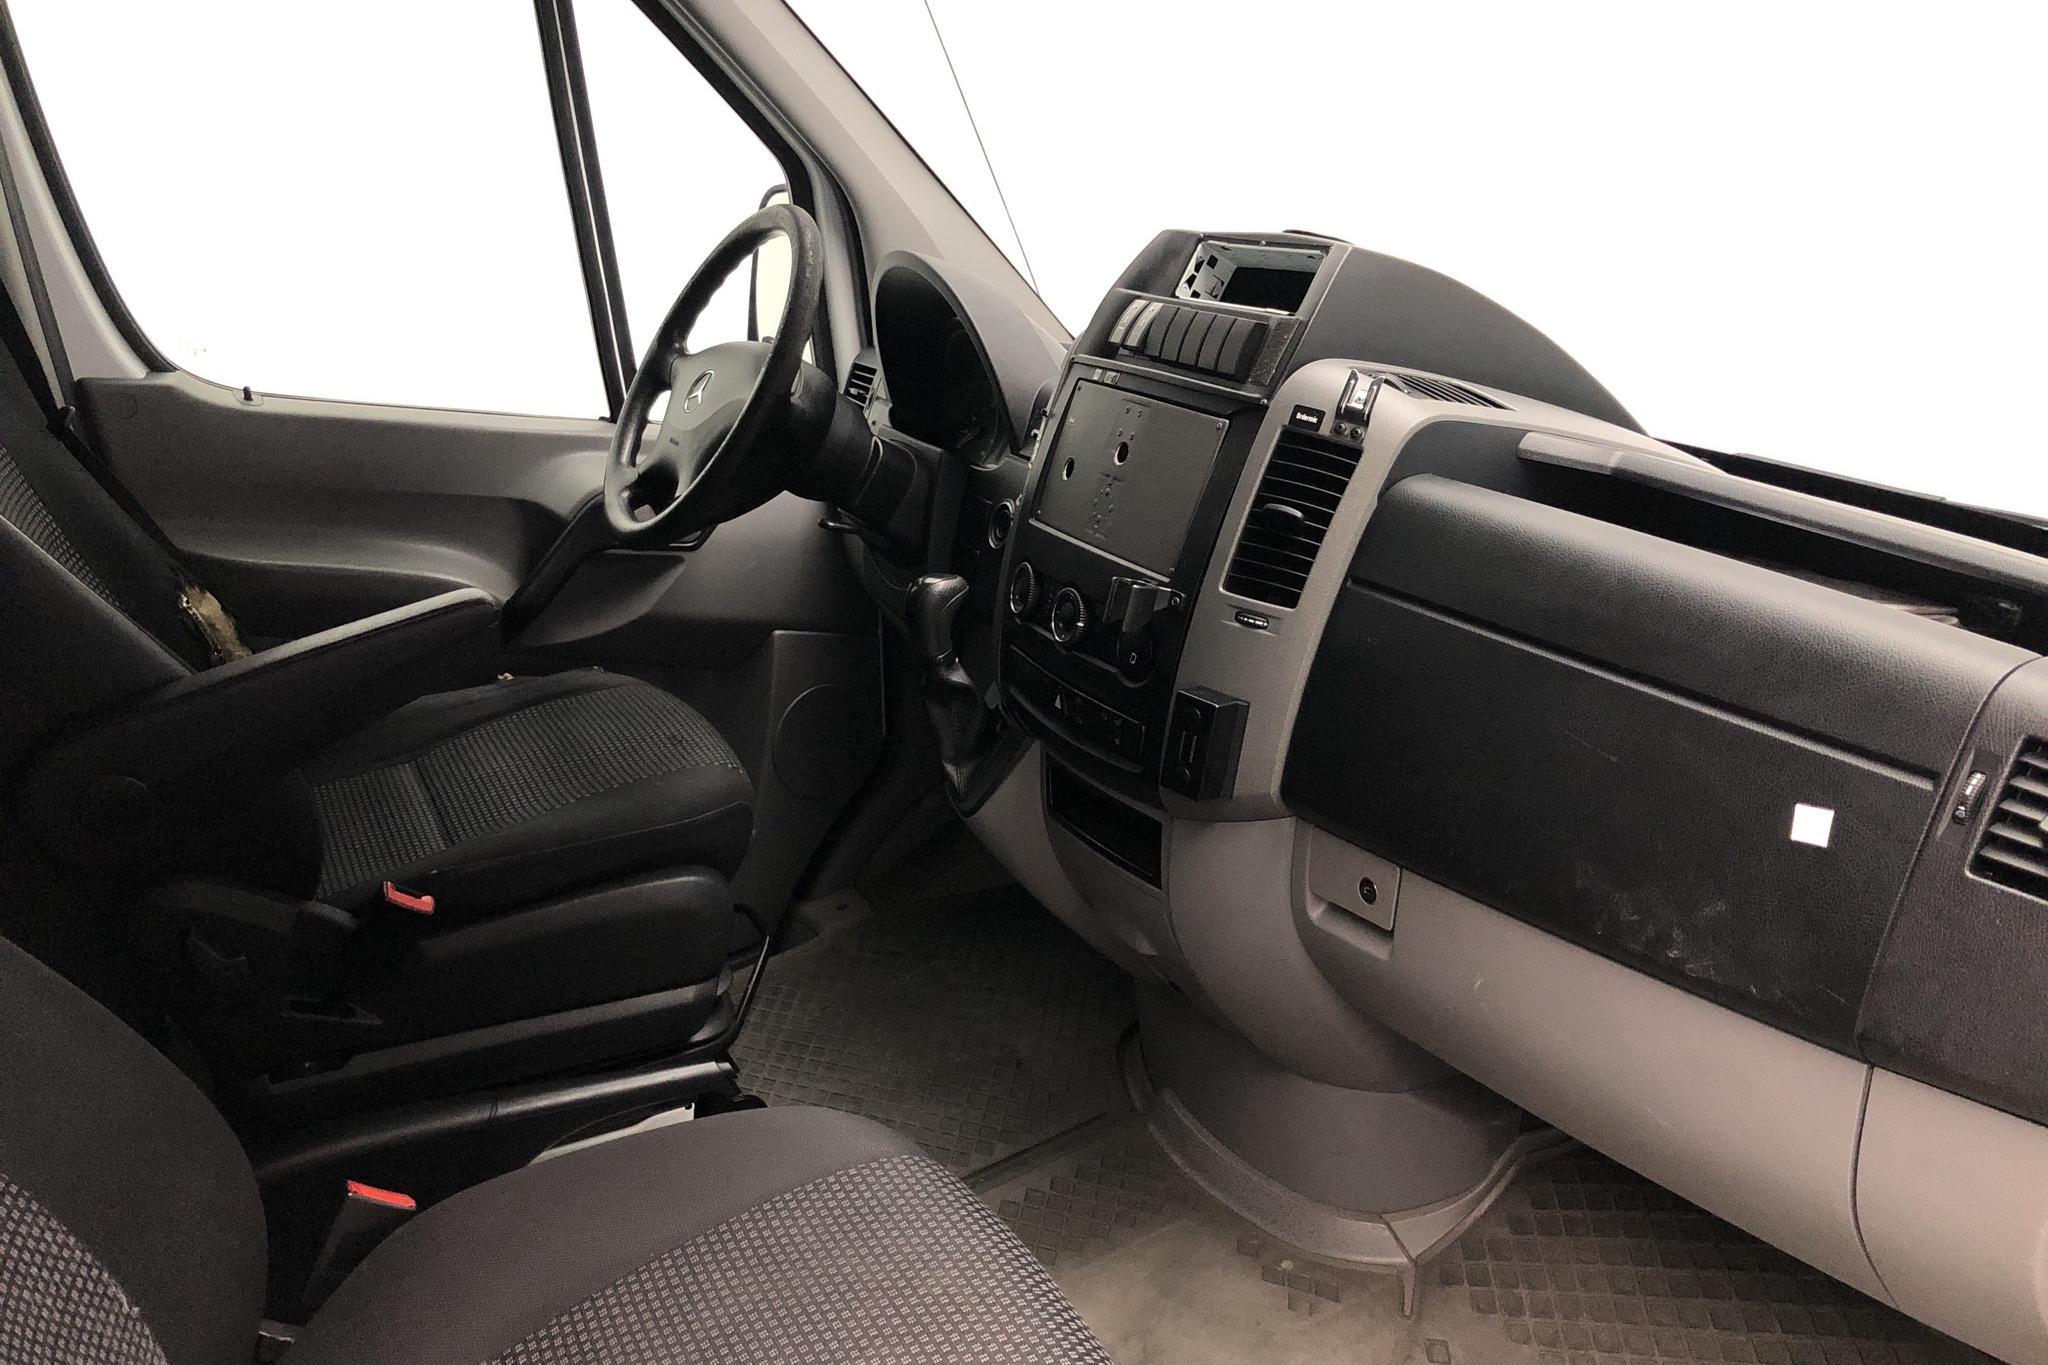 Mercedes Sprinter 318 CDI (184hk) - 144 900 km - Automatic - 2007